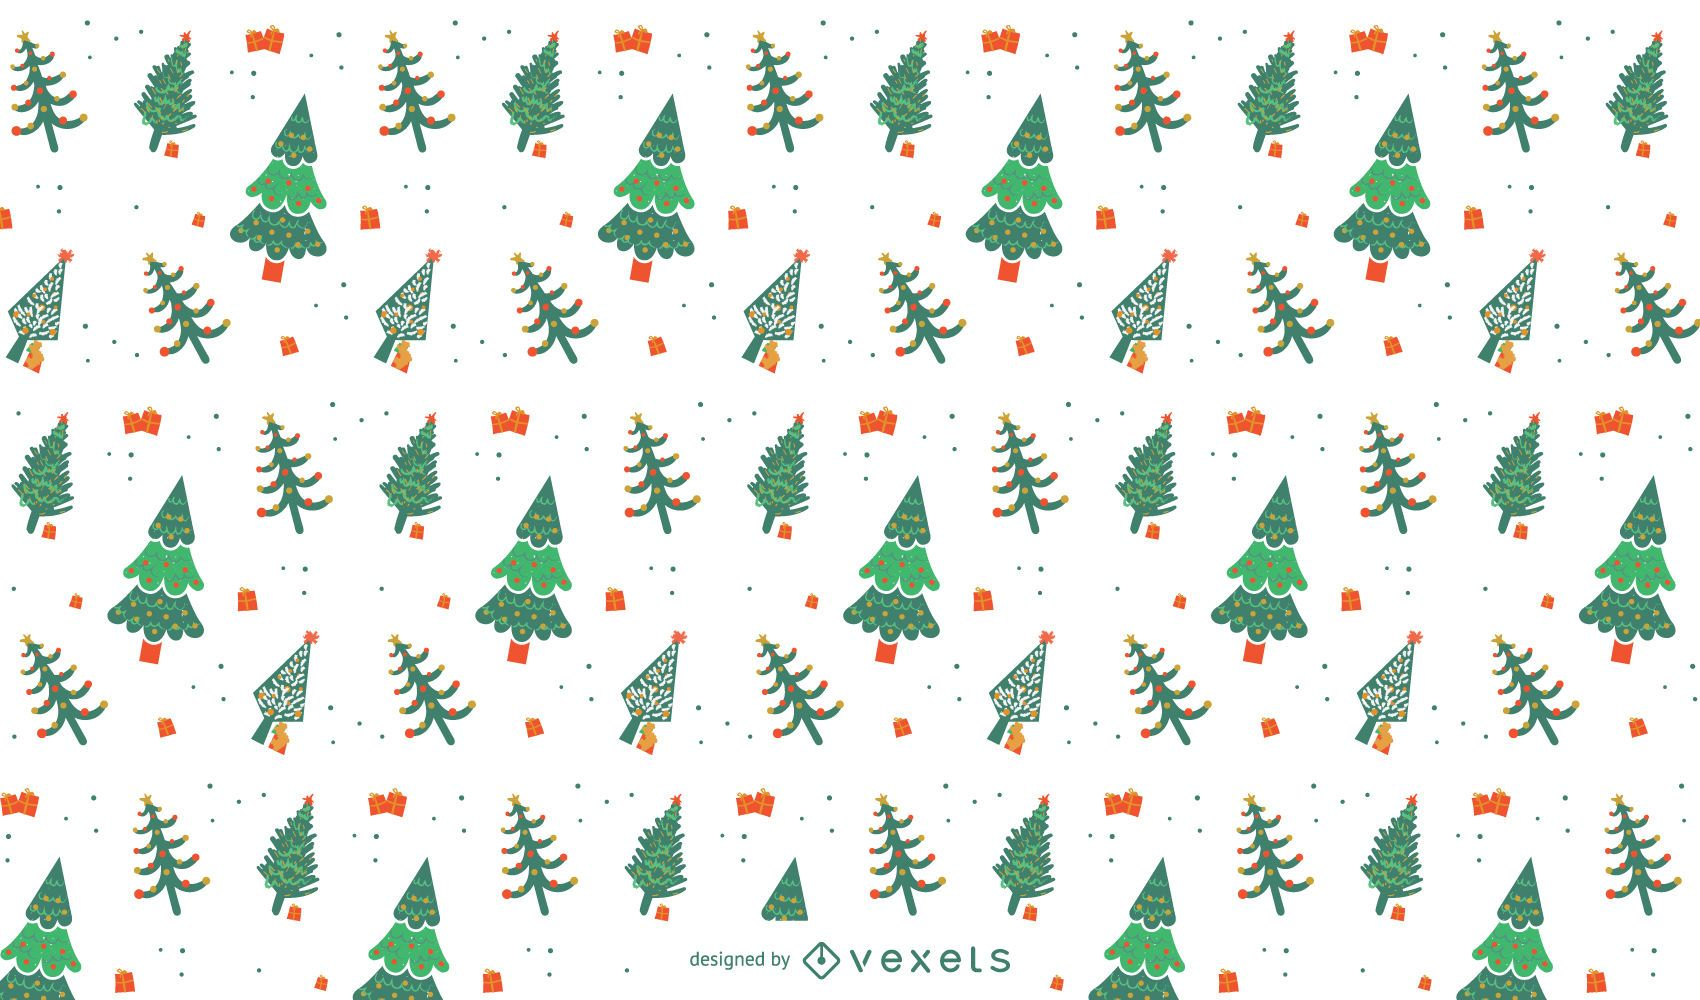 Christmas trees pattern design